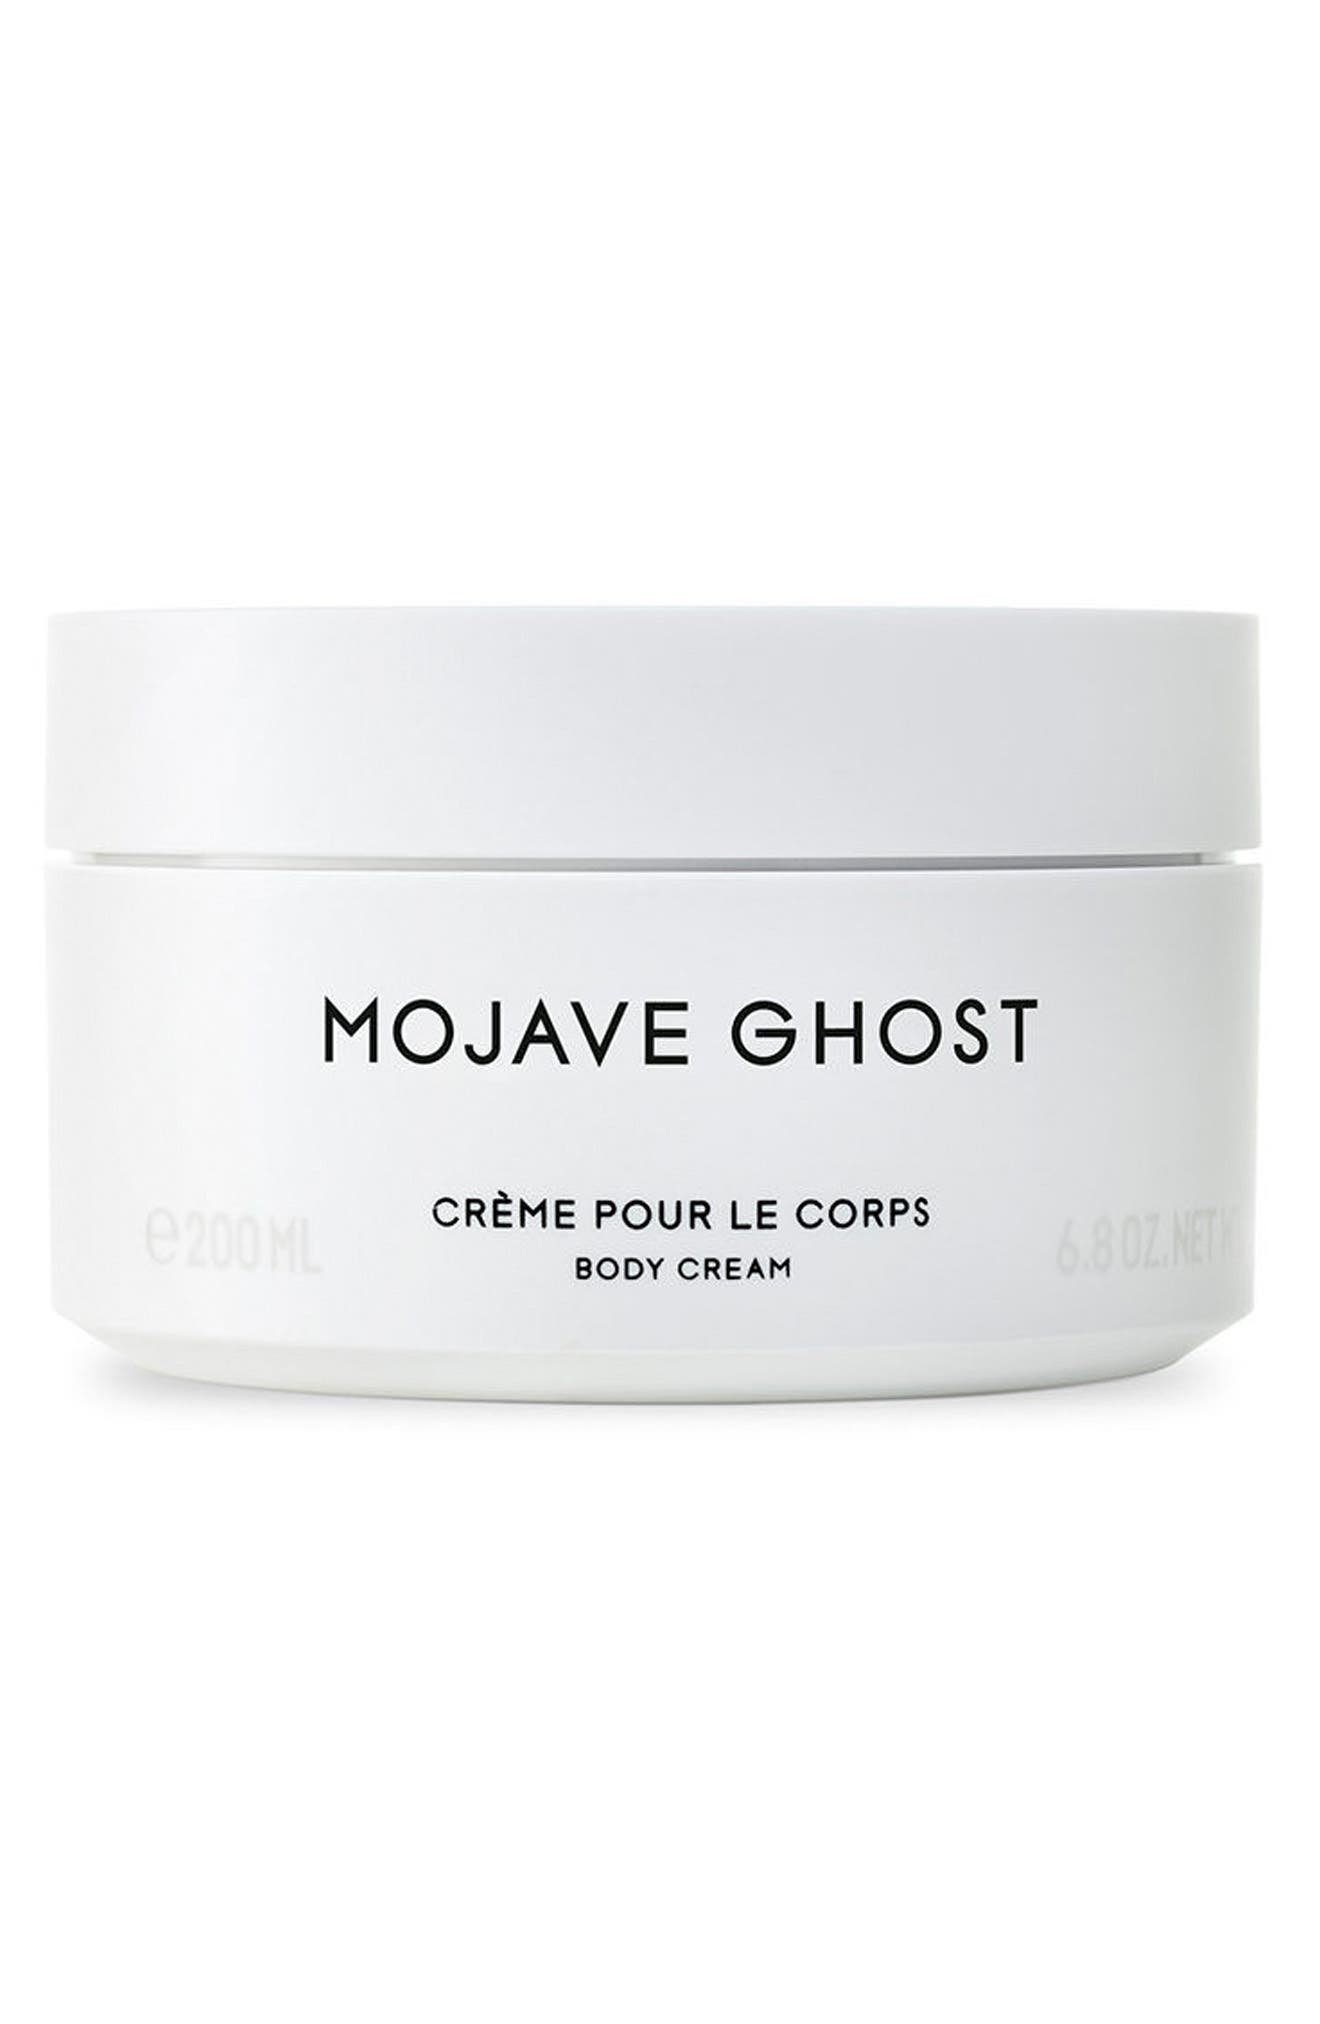 Mojave Ghost Body Cream,                             Main thumbnail 1, color,                             No Color